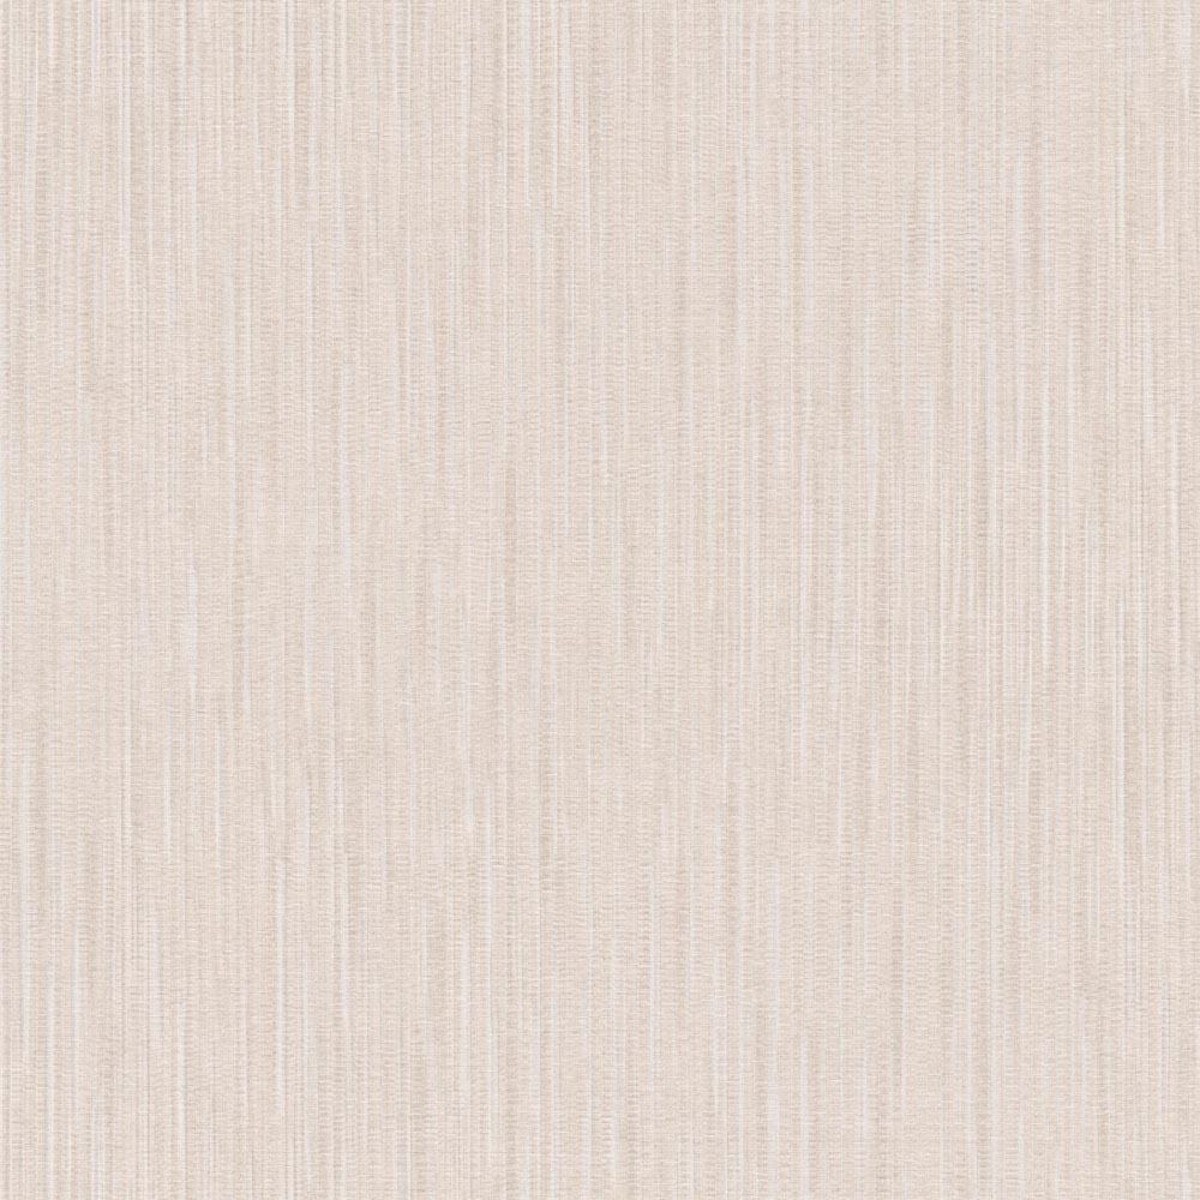 Обои виниловые Палитра Florencia PL71574-24 1.06 м